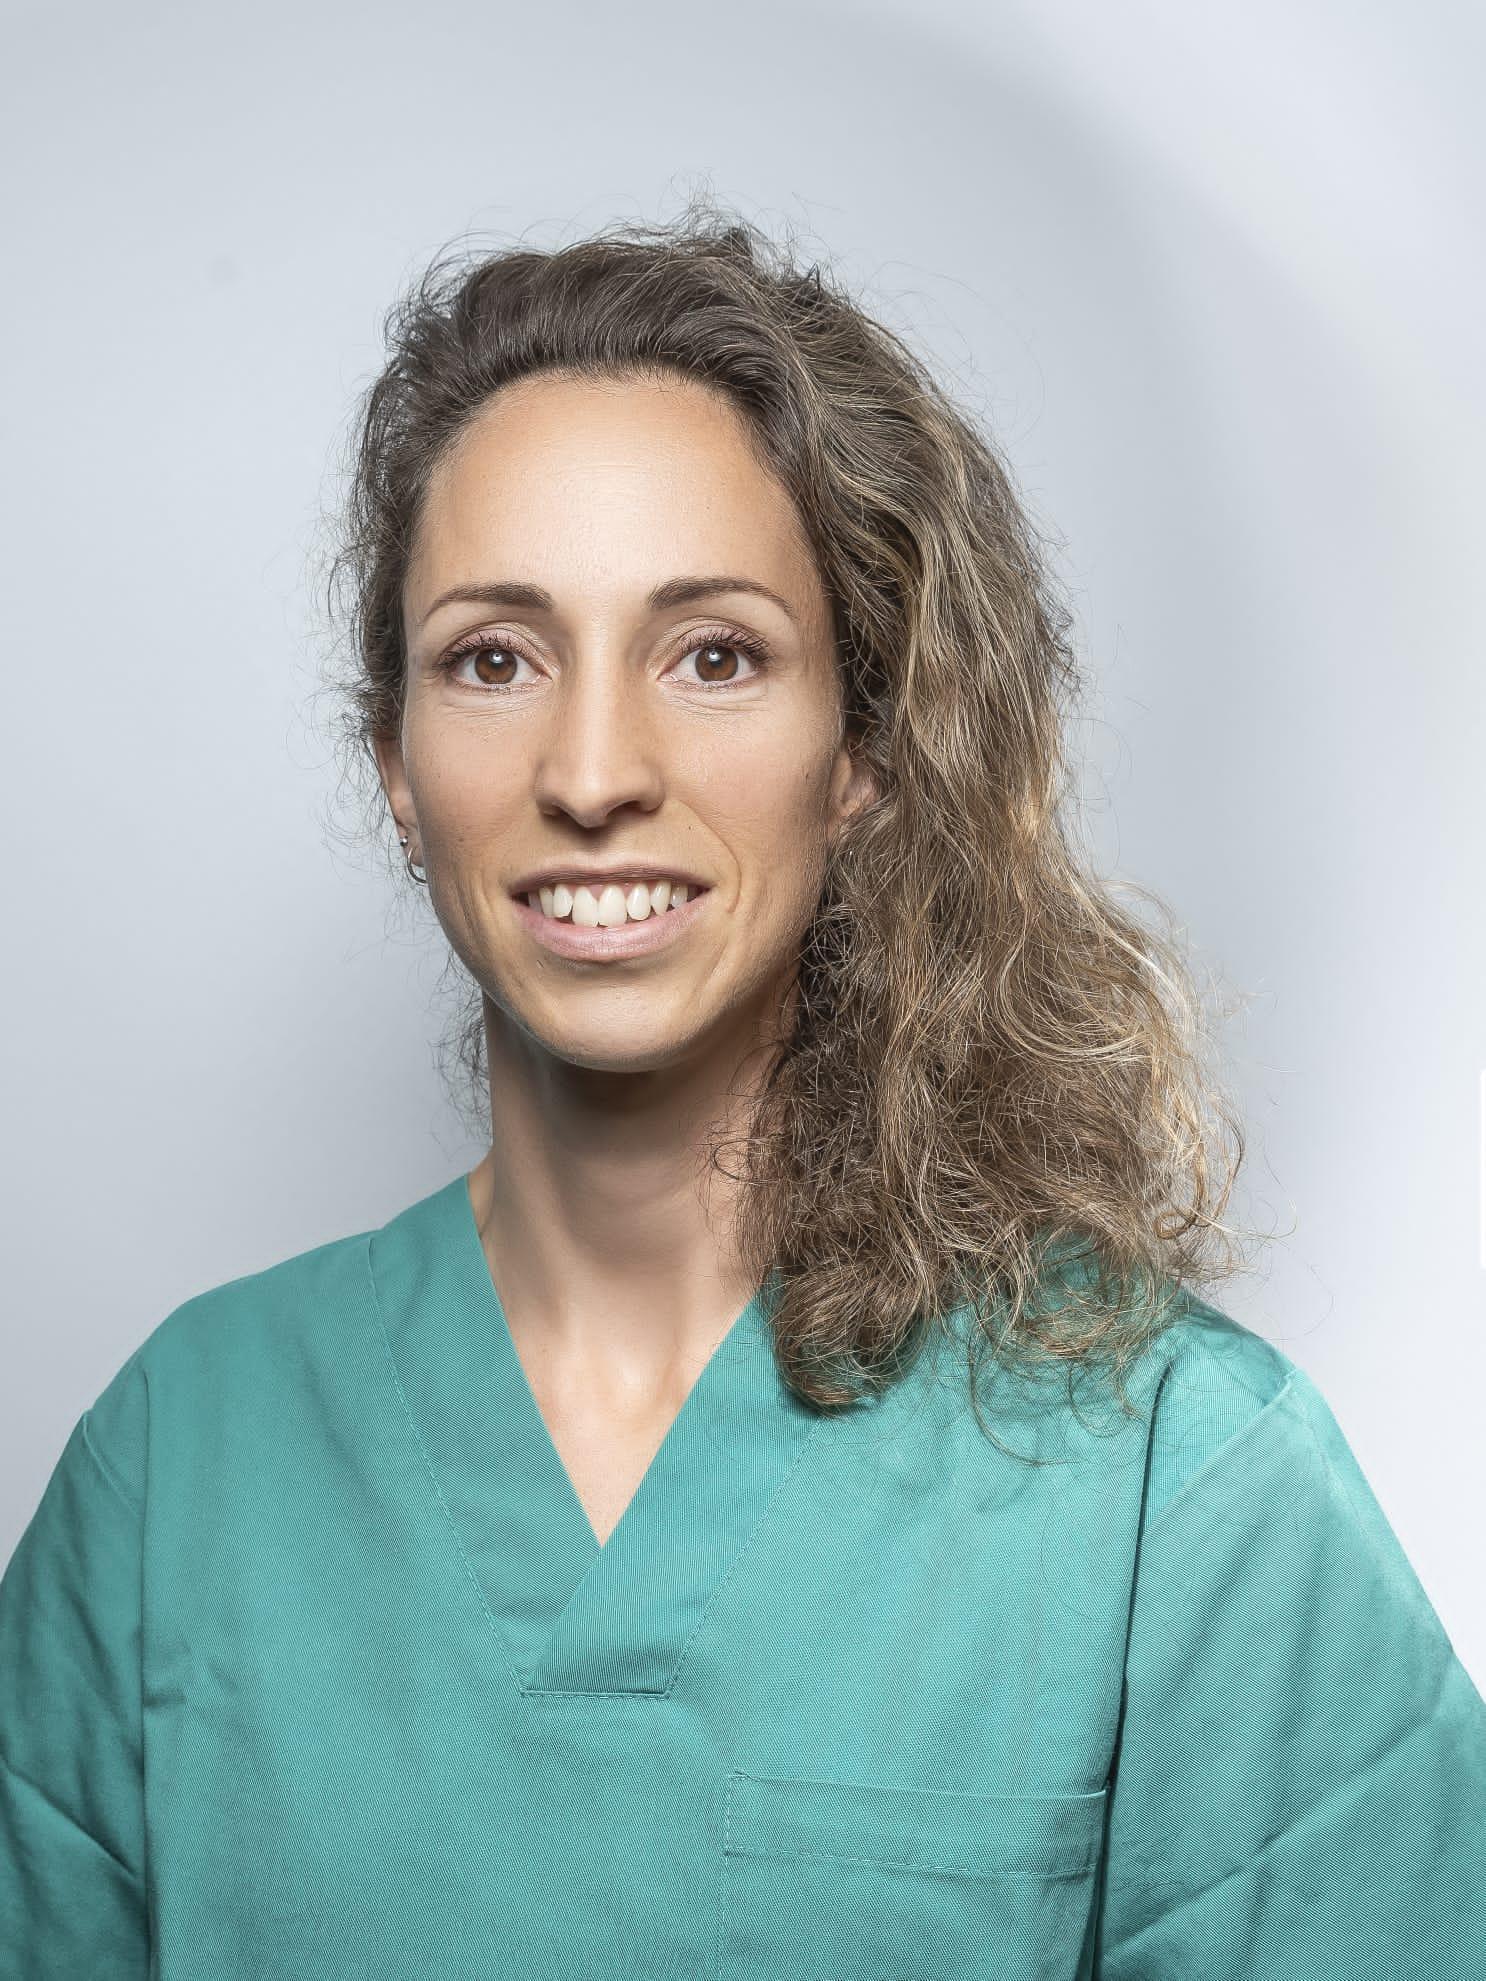 Niria Martínez fisioterapeuta FISIOGDS santiago de Compostela